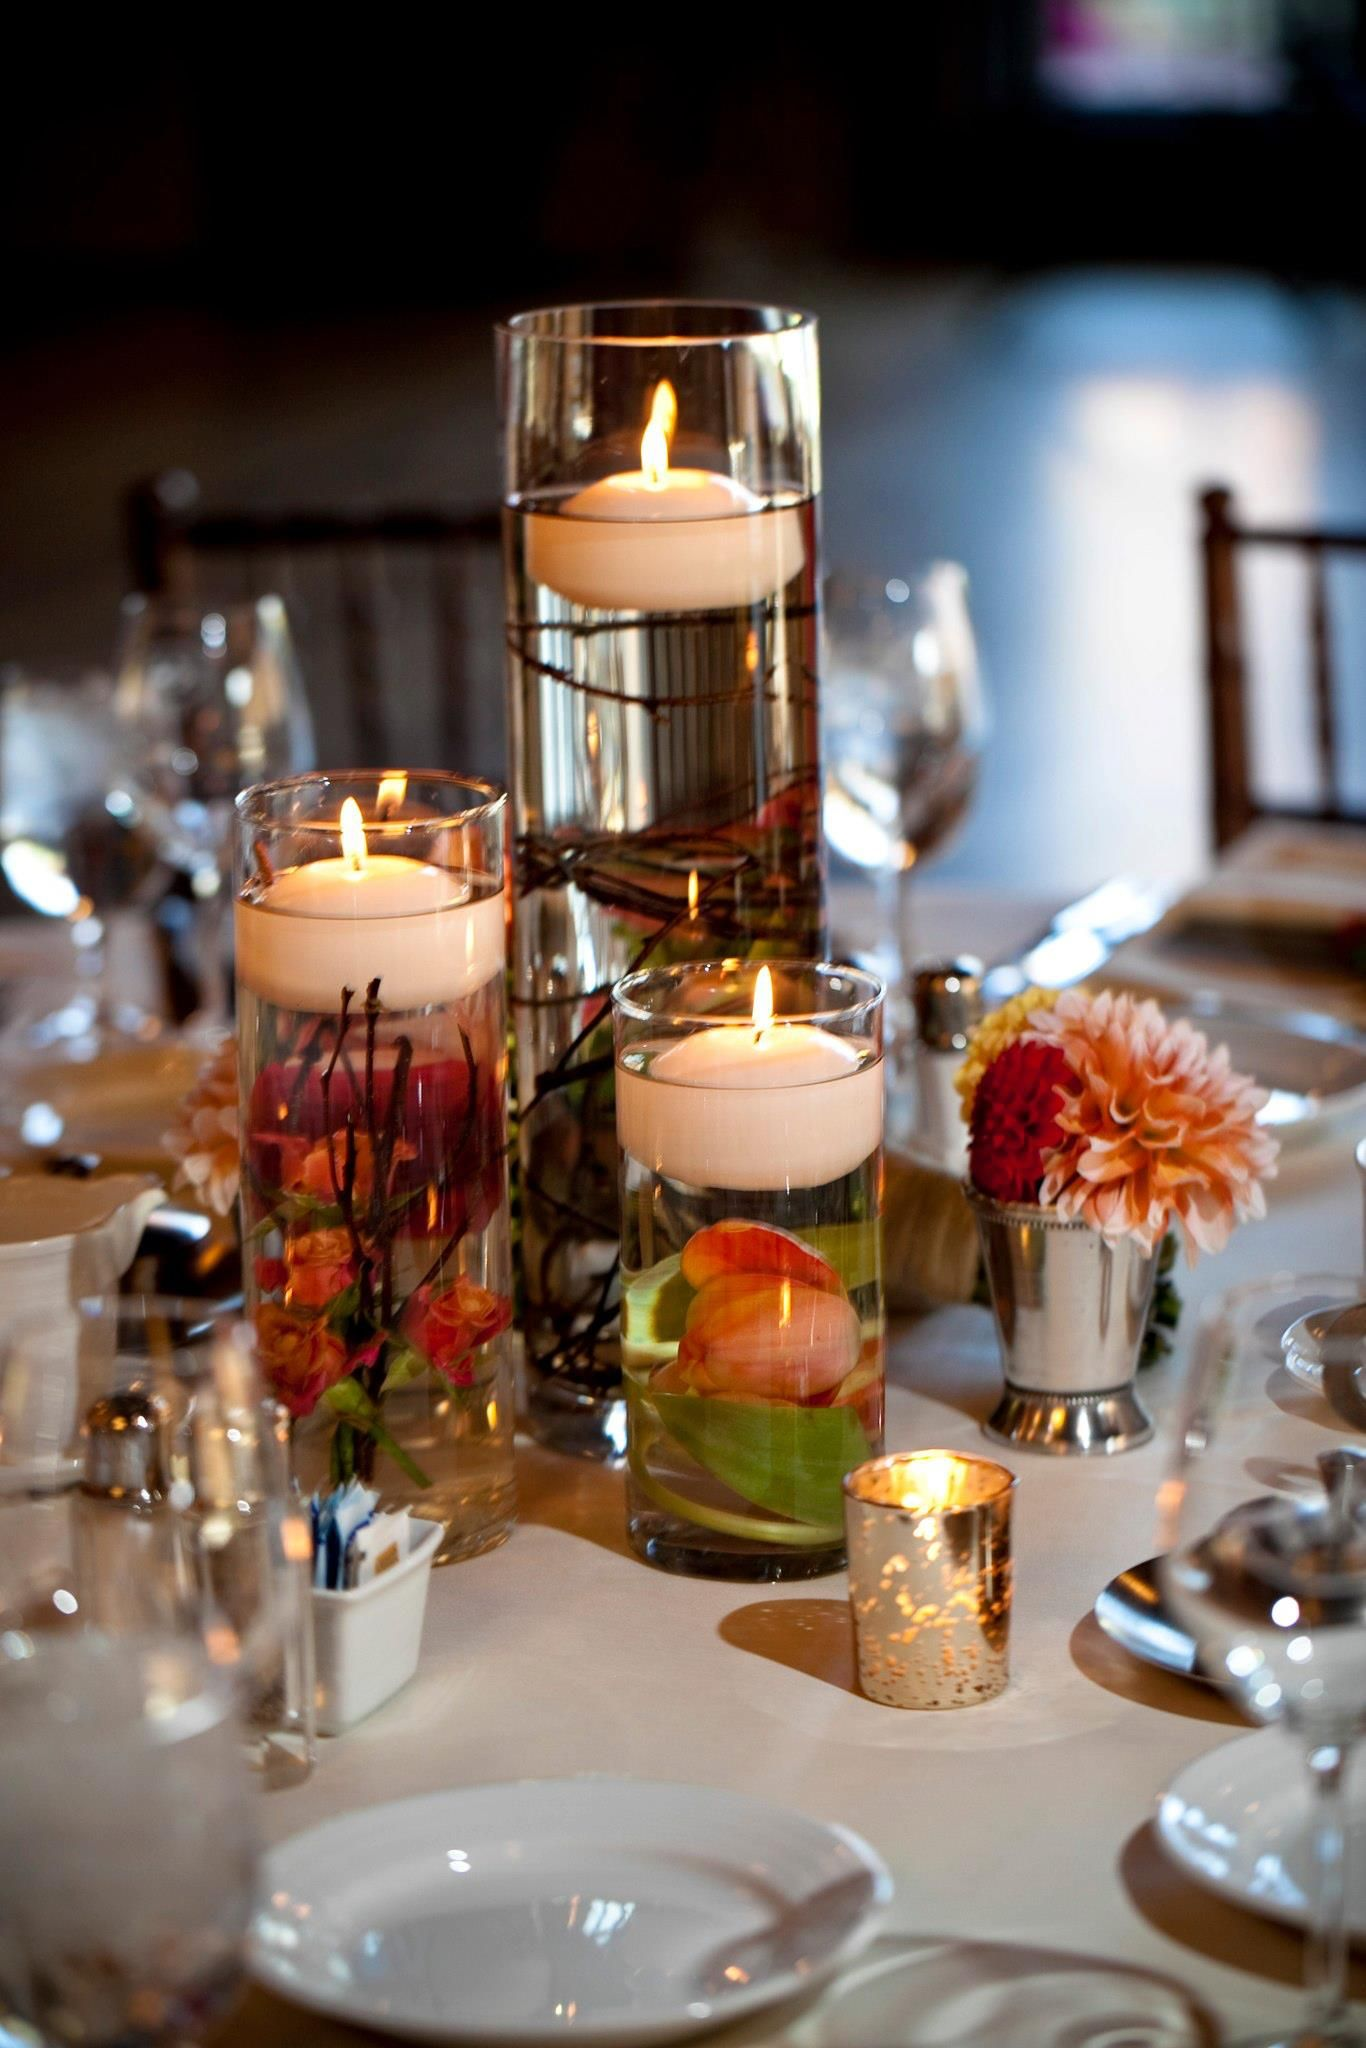 Floating Candle Wedding Centerpiece With Submerged Flowers And Br Floating Candle Centerpieces Candle Wedding Centerpieces Floating Candle Centerpieces Wedding